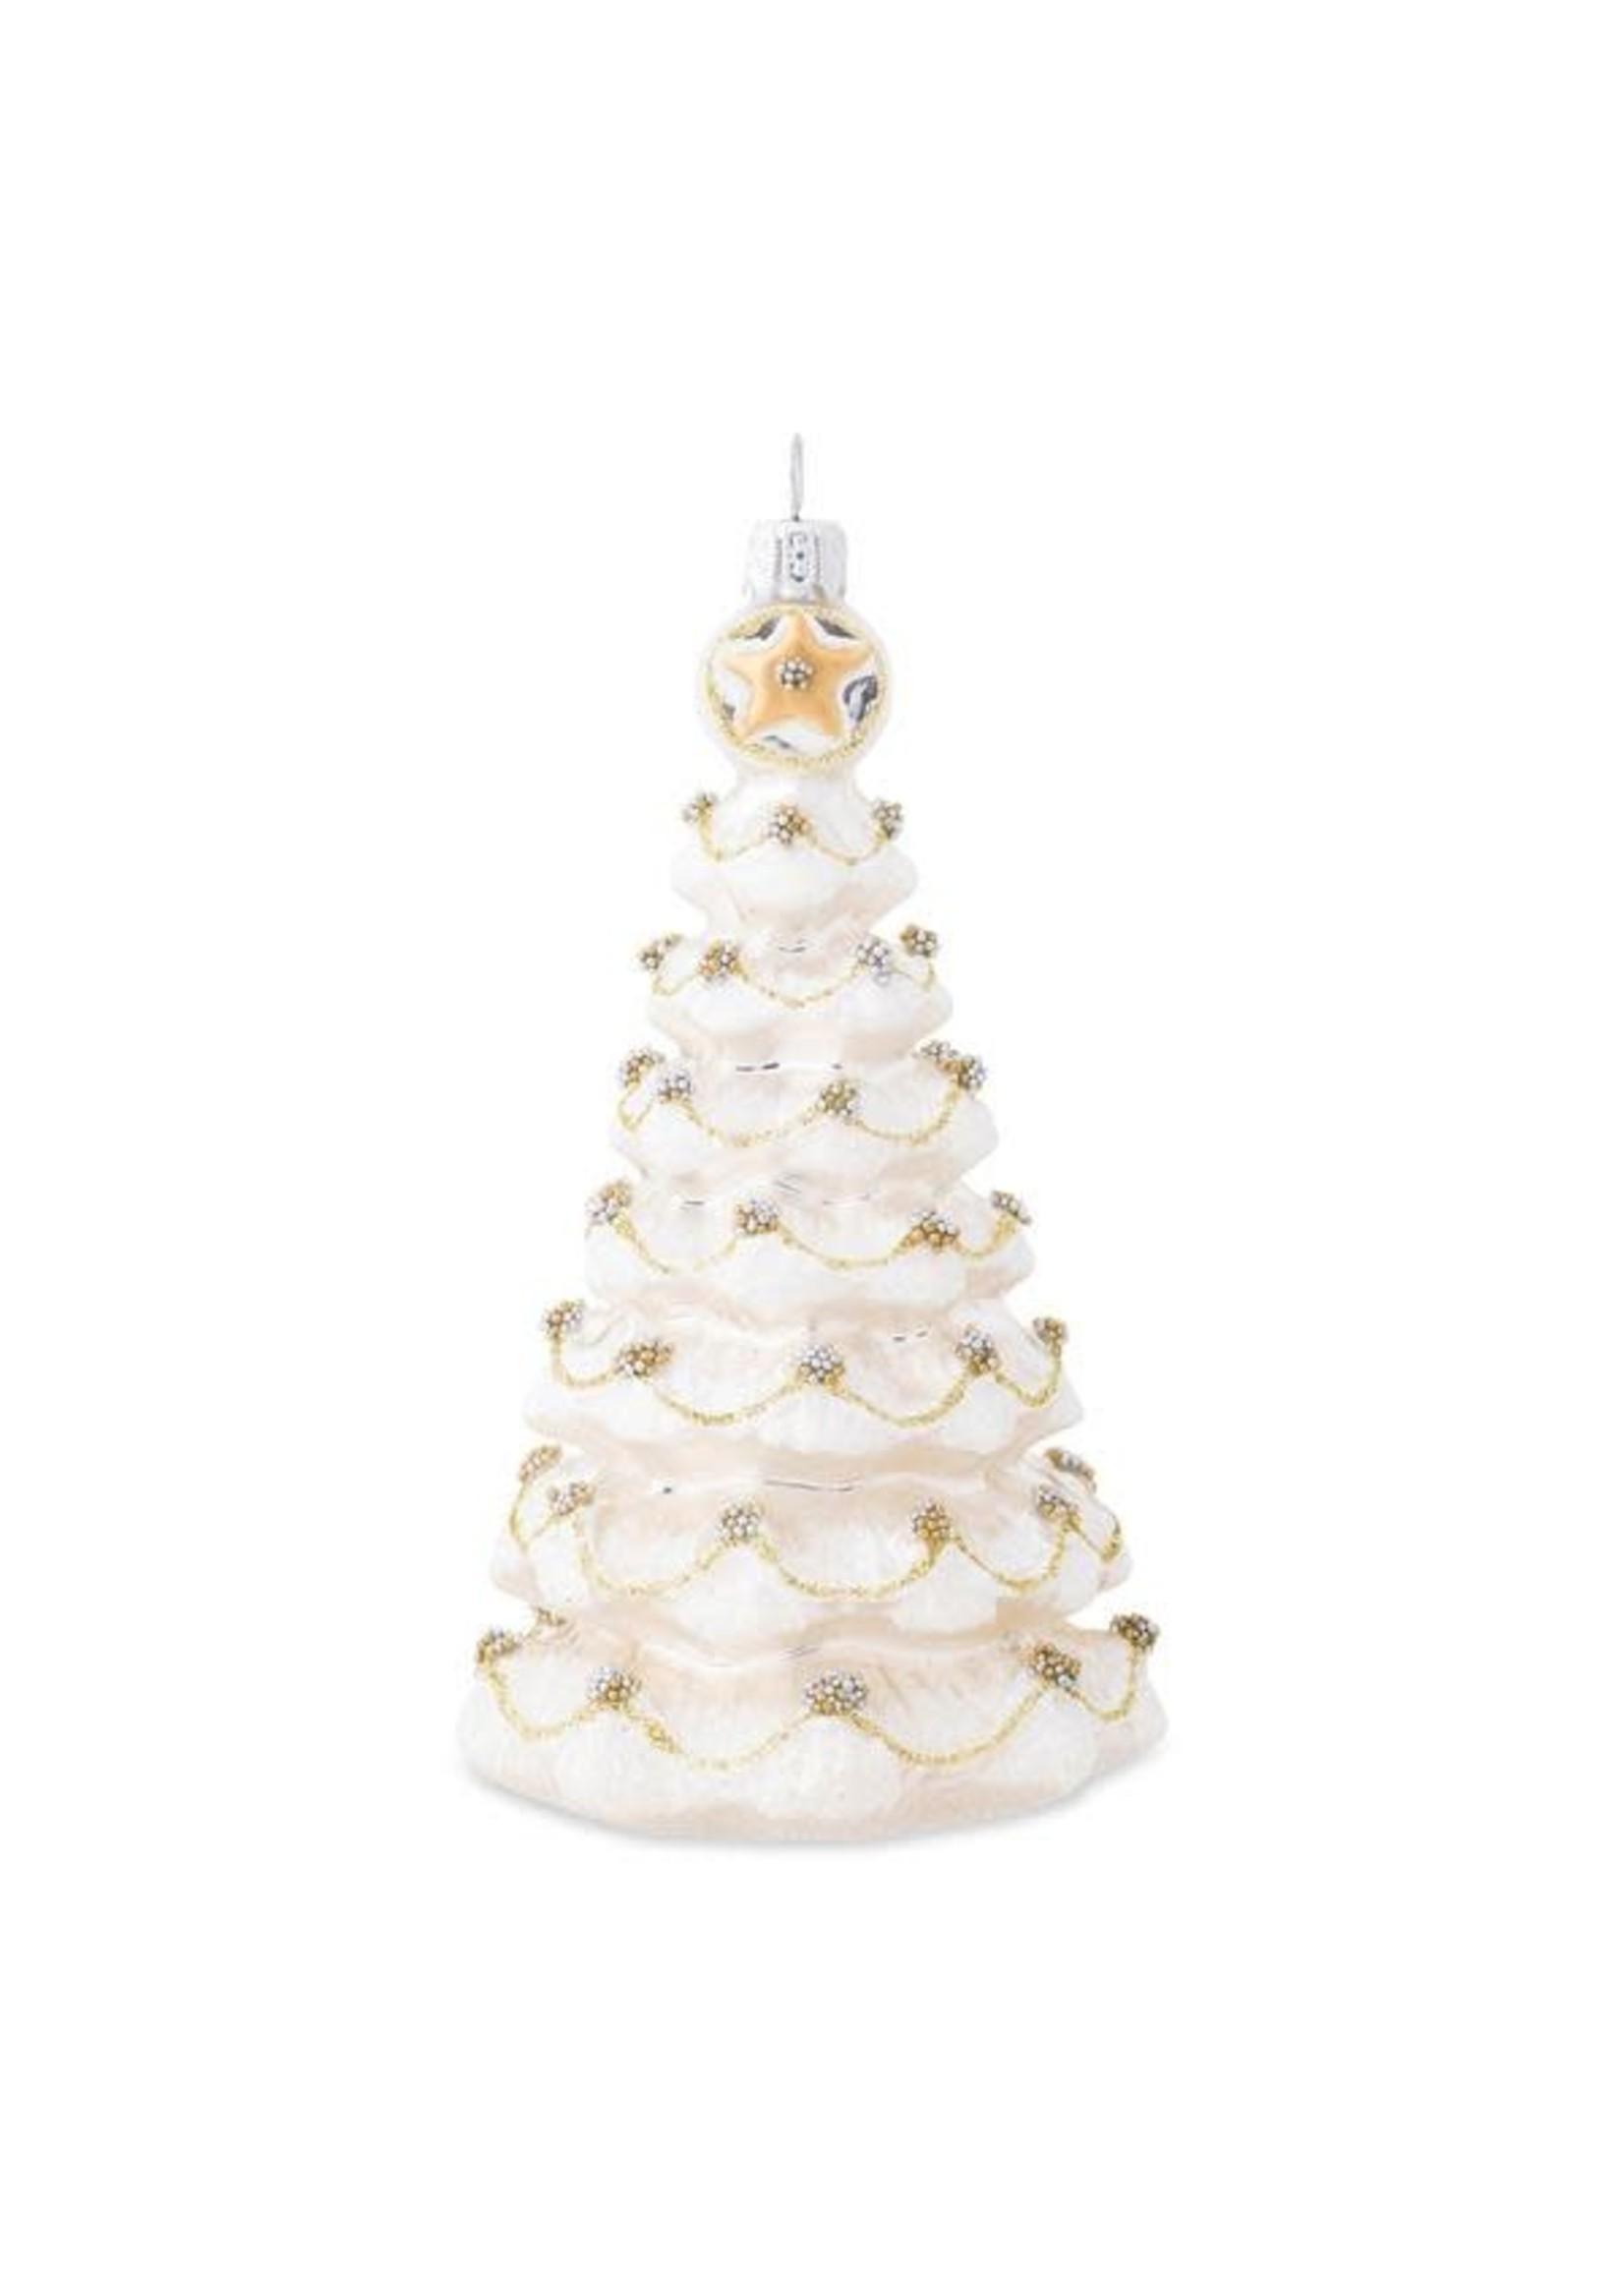 Juliska Ornament - Gold & Silver Tree